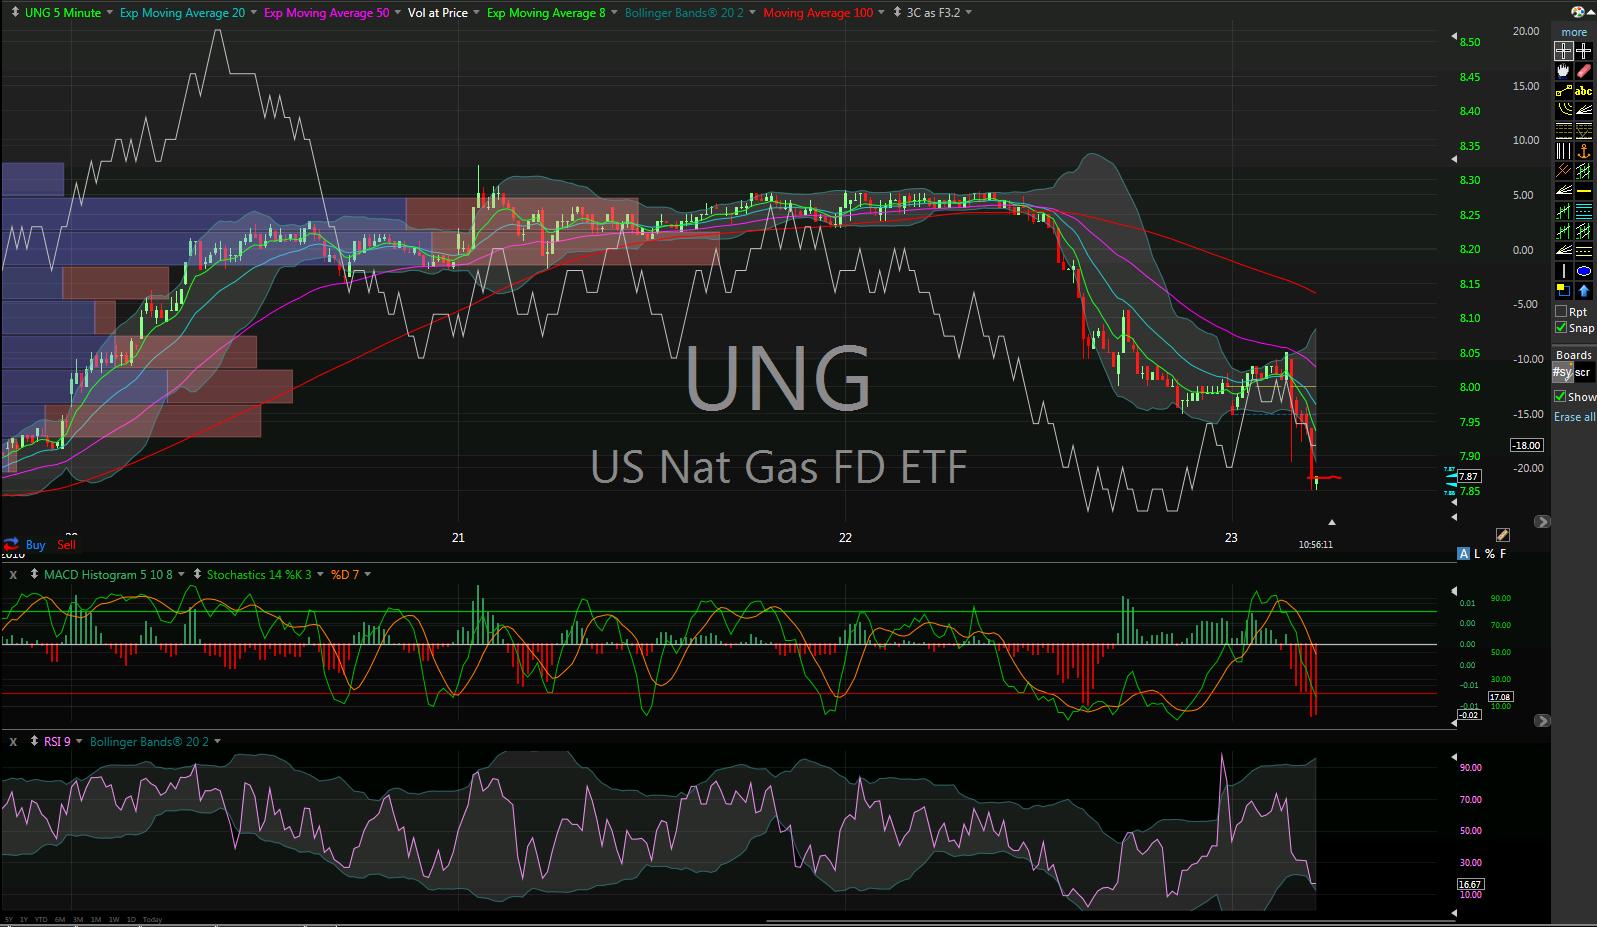 Closed UNG short exit 7.90 33c profit approx 4%